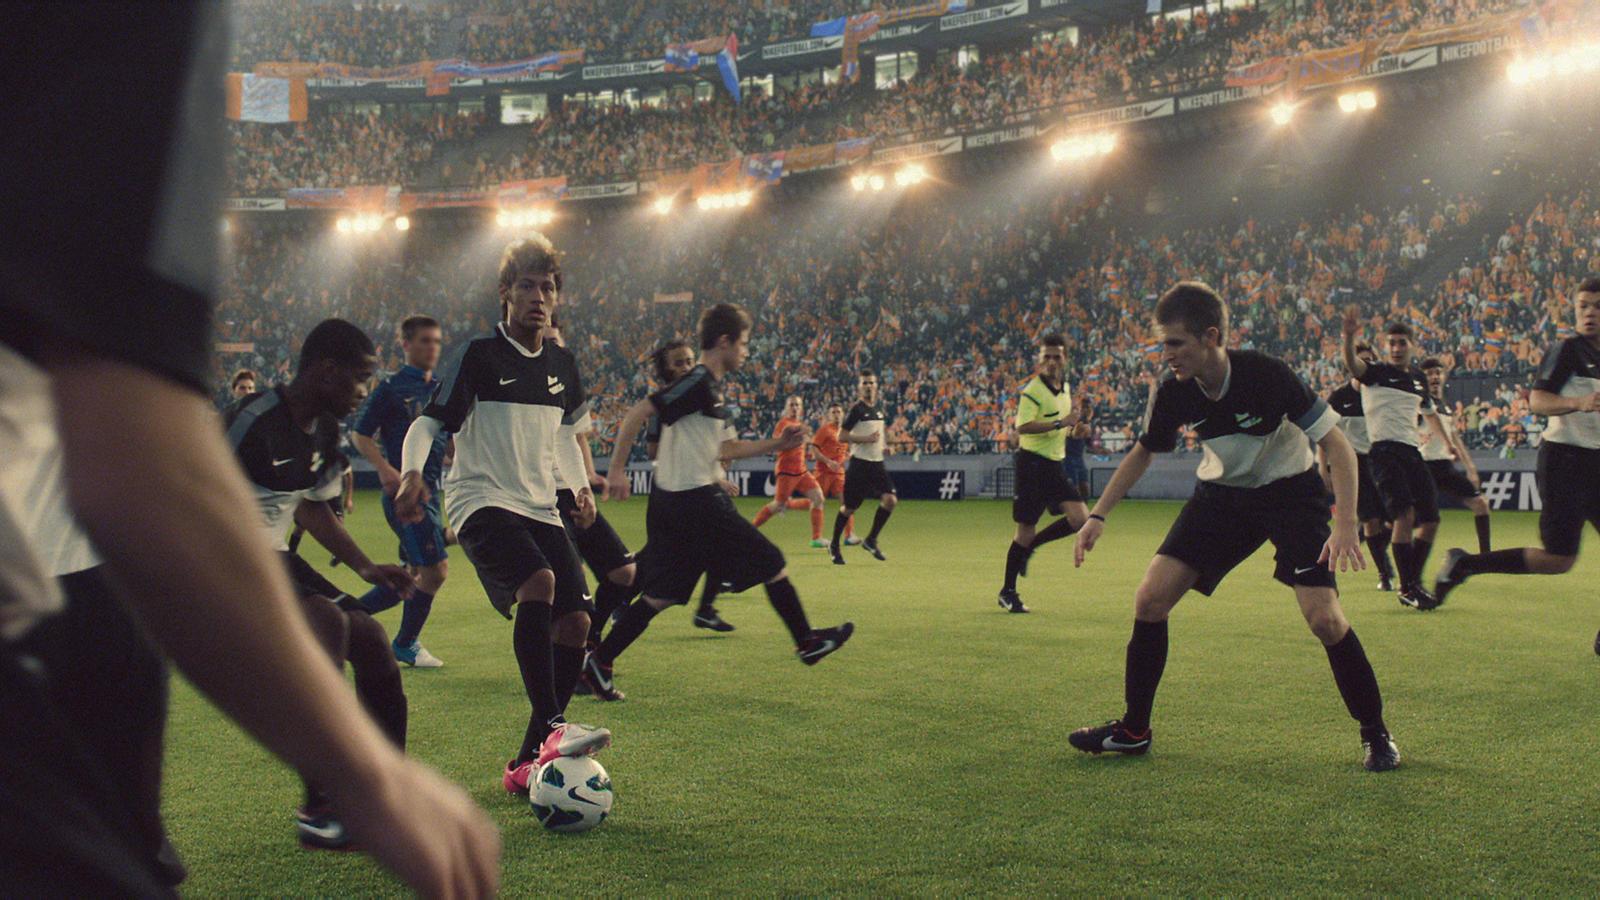 Nike MyTimeIsNow Campaign Neymar.  Nike MyTimeIsNow Campaign Teaser Sneijder.  Nike MyTimeIsNow Campaign CristianoRonaldo. Nike MyTimeIsNow Campaign Ribery 0e10b77a2